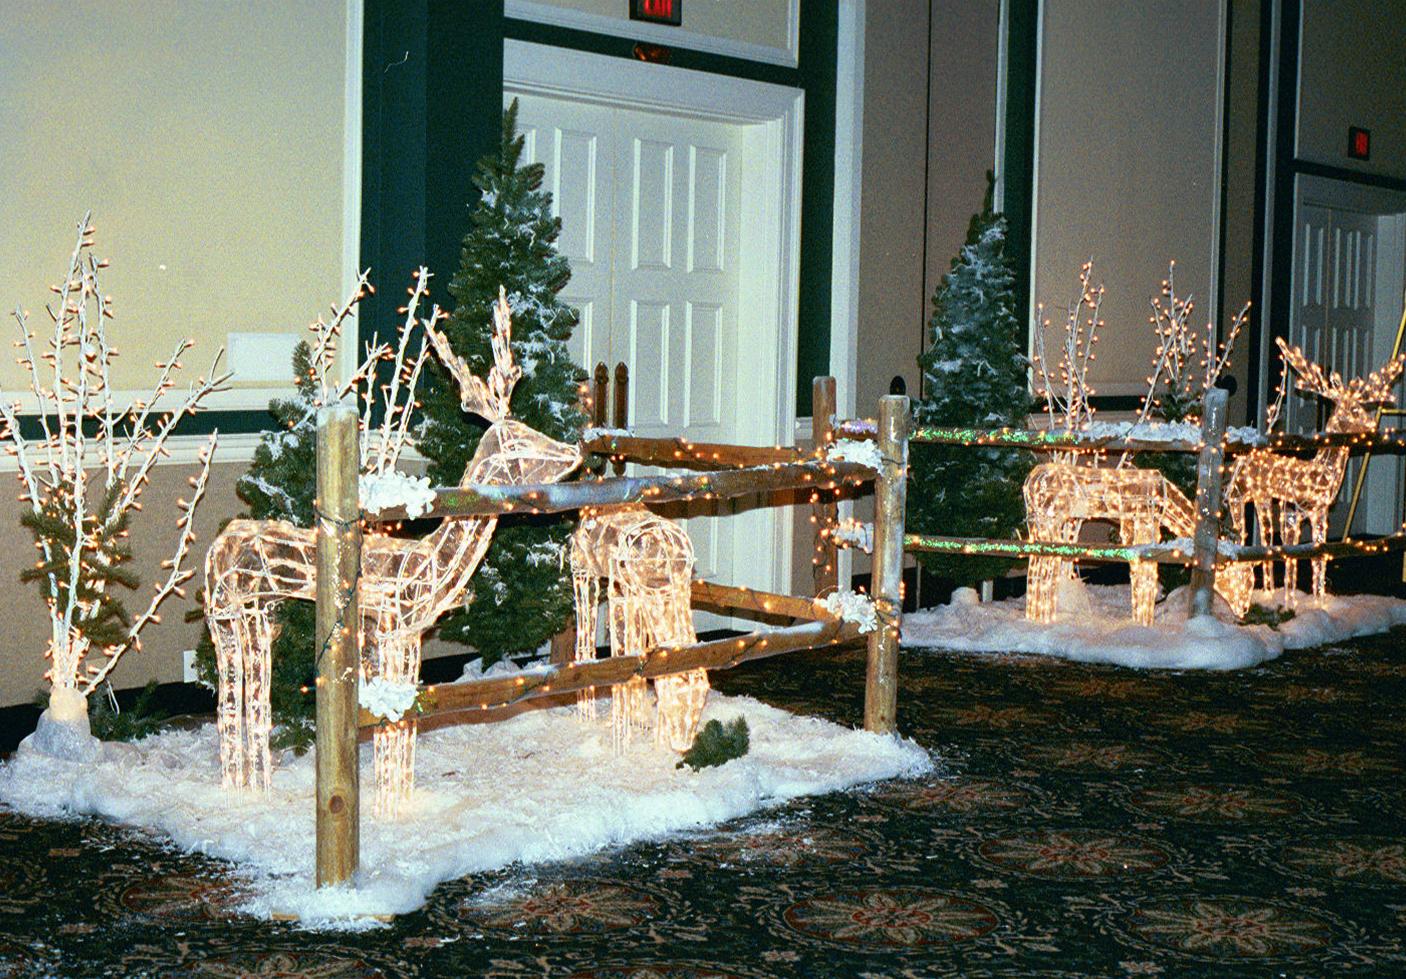 Holiday Entrance Decor